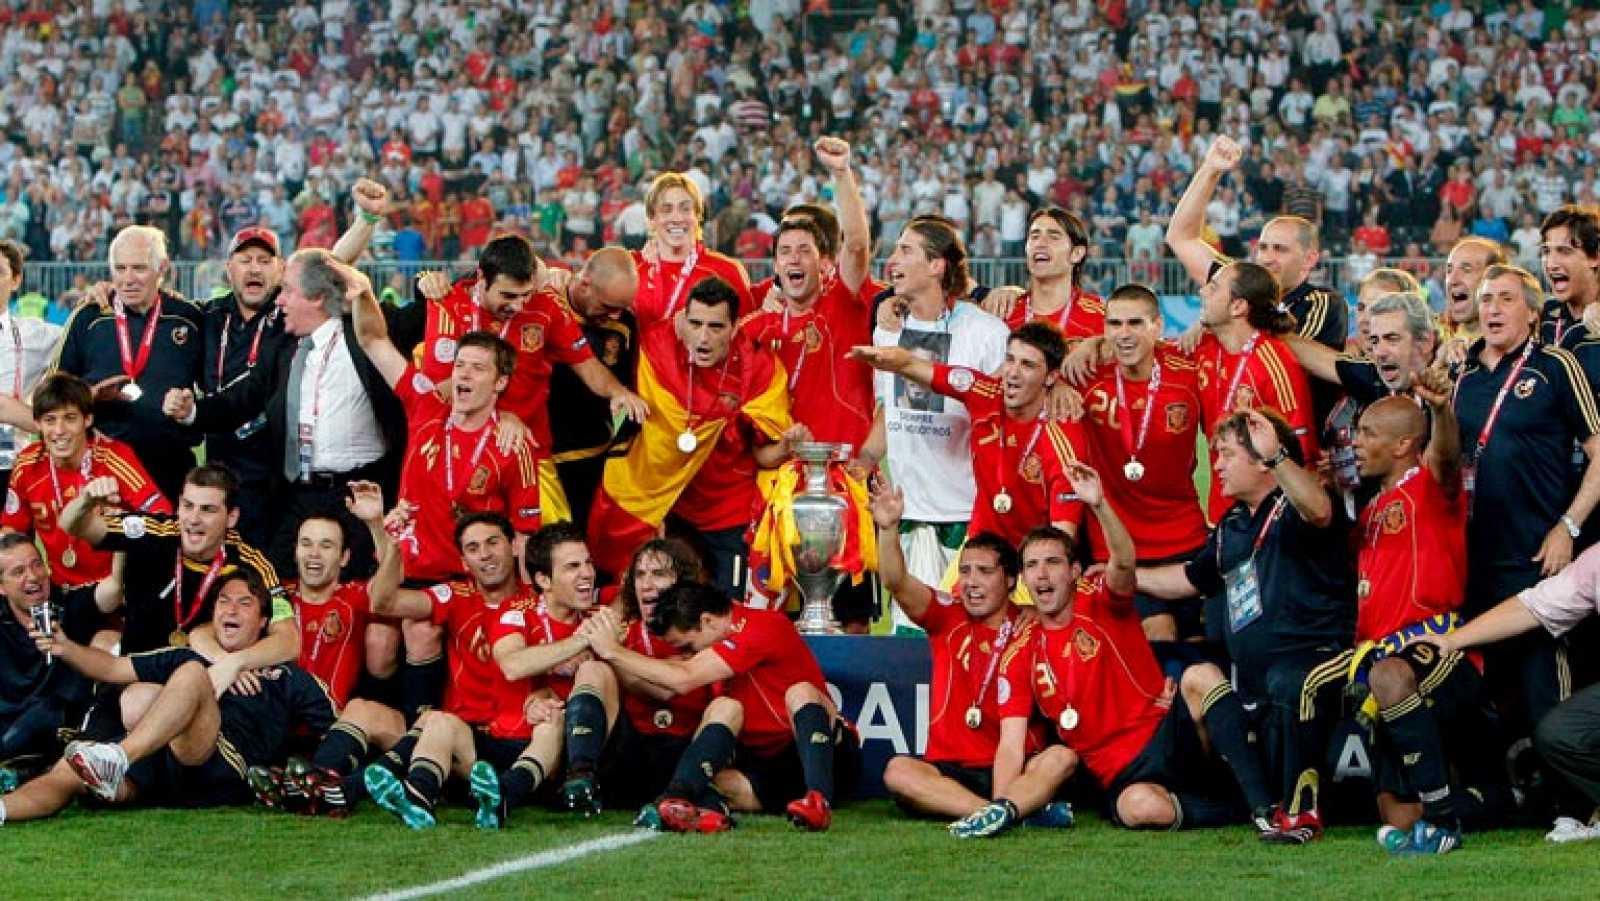 diseño exquisito buena reputación renombre mundial Eurocopa 2008: España campeona (Informe Semanal: locura futbolística)